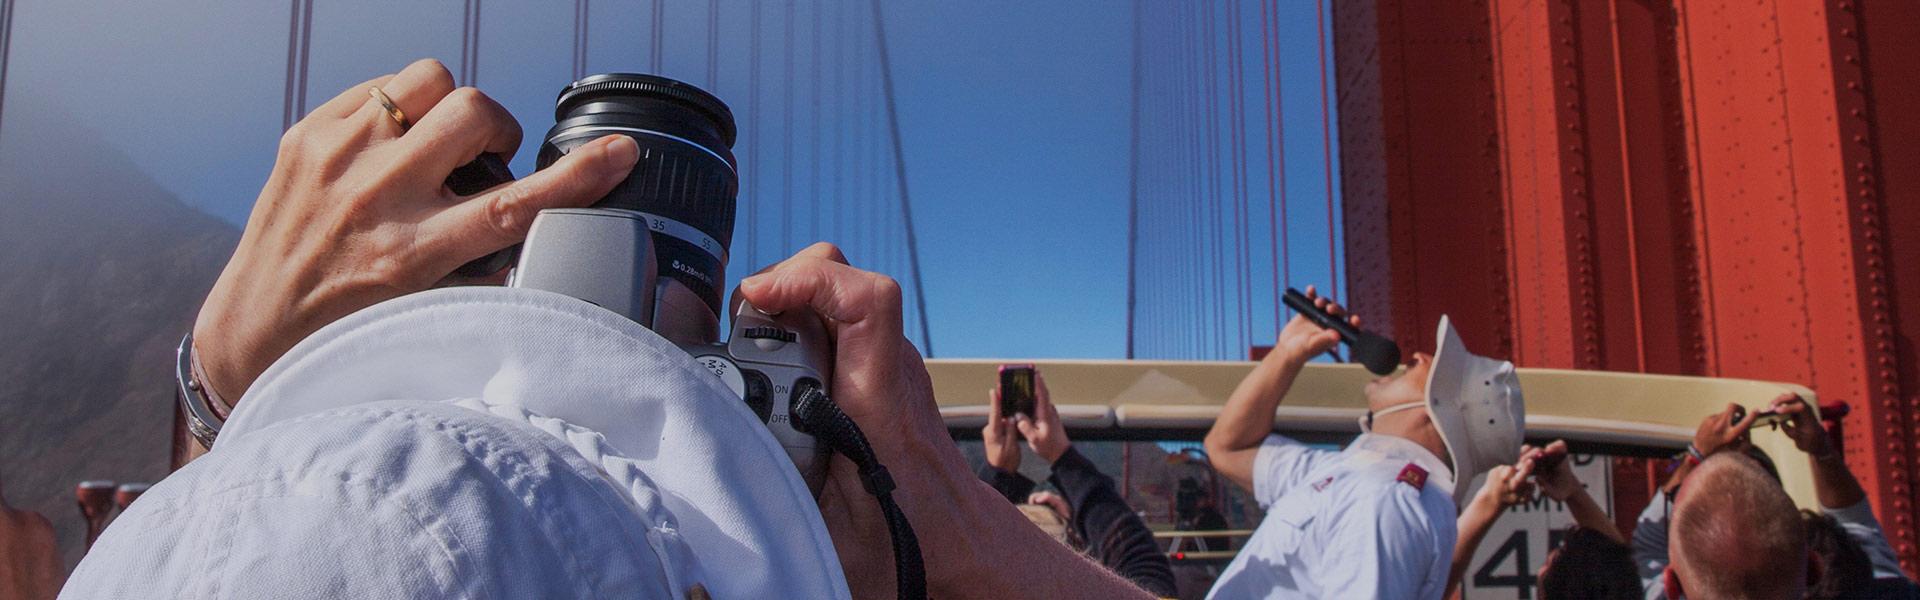 View of the Golden Gate Bridge San Francisco